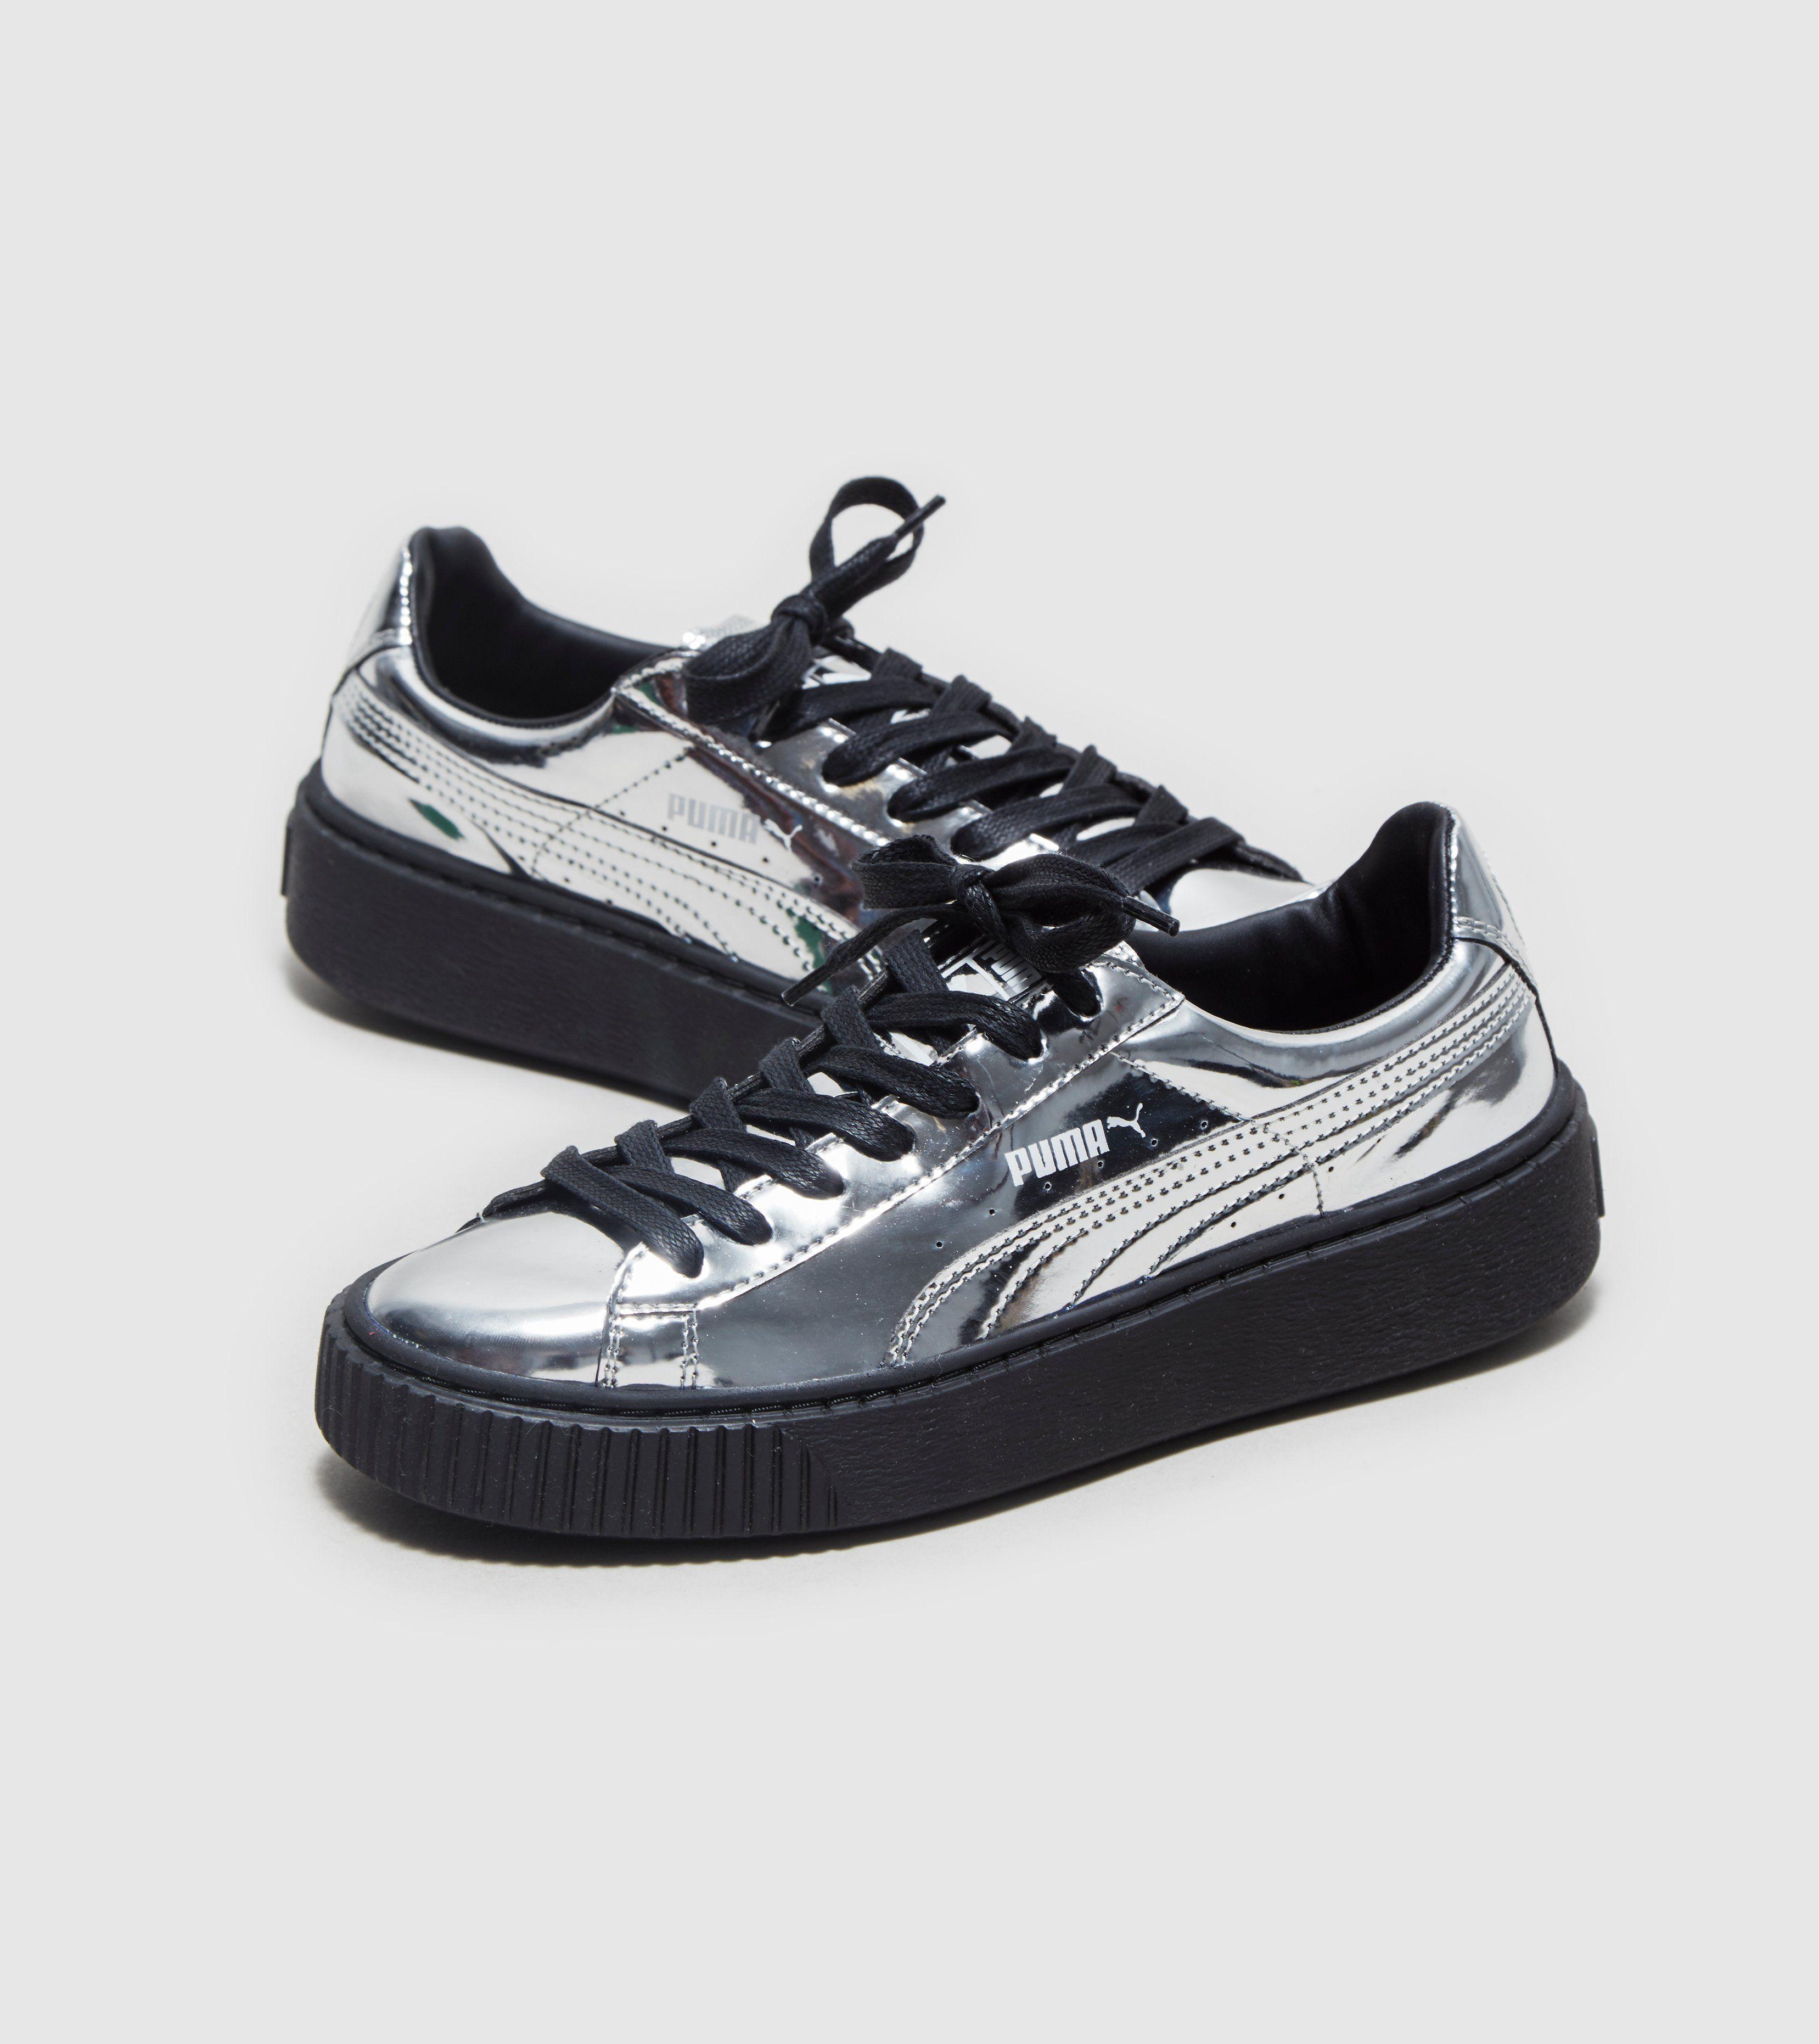 puma basket sneakers metallic